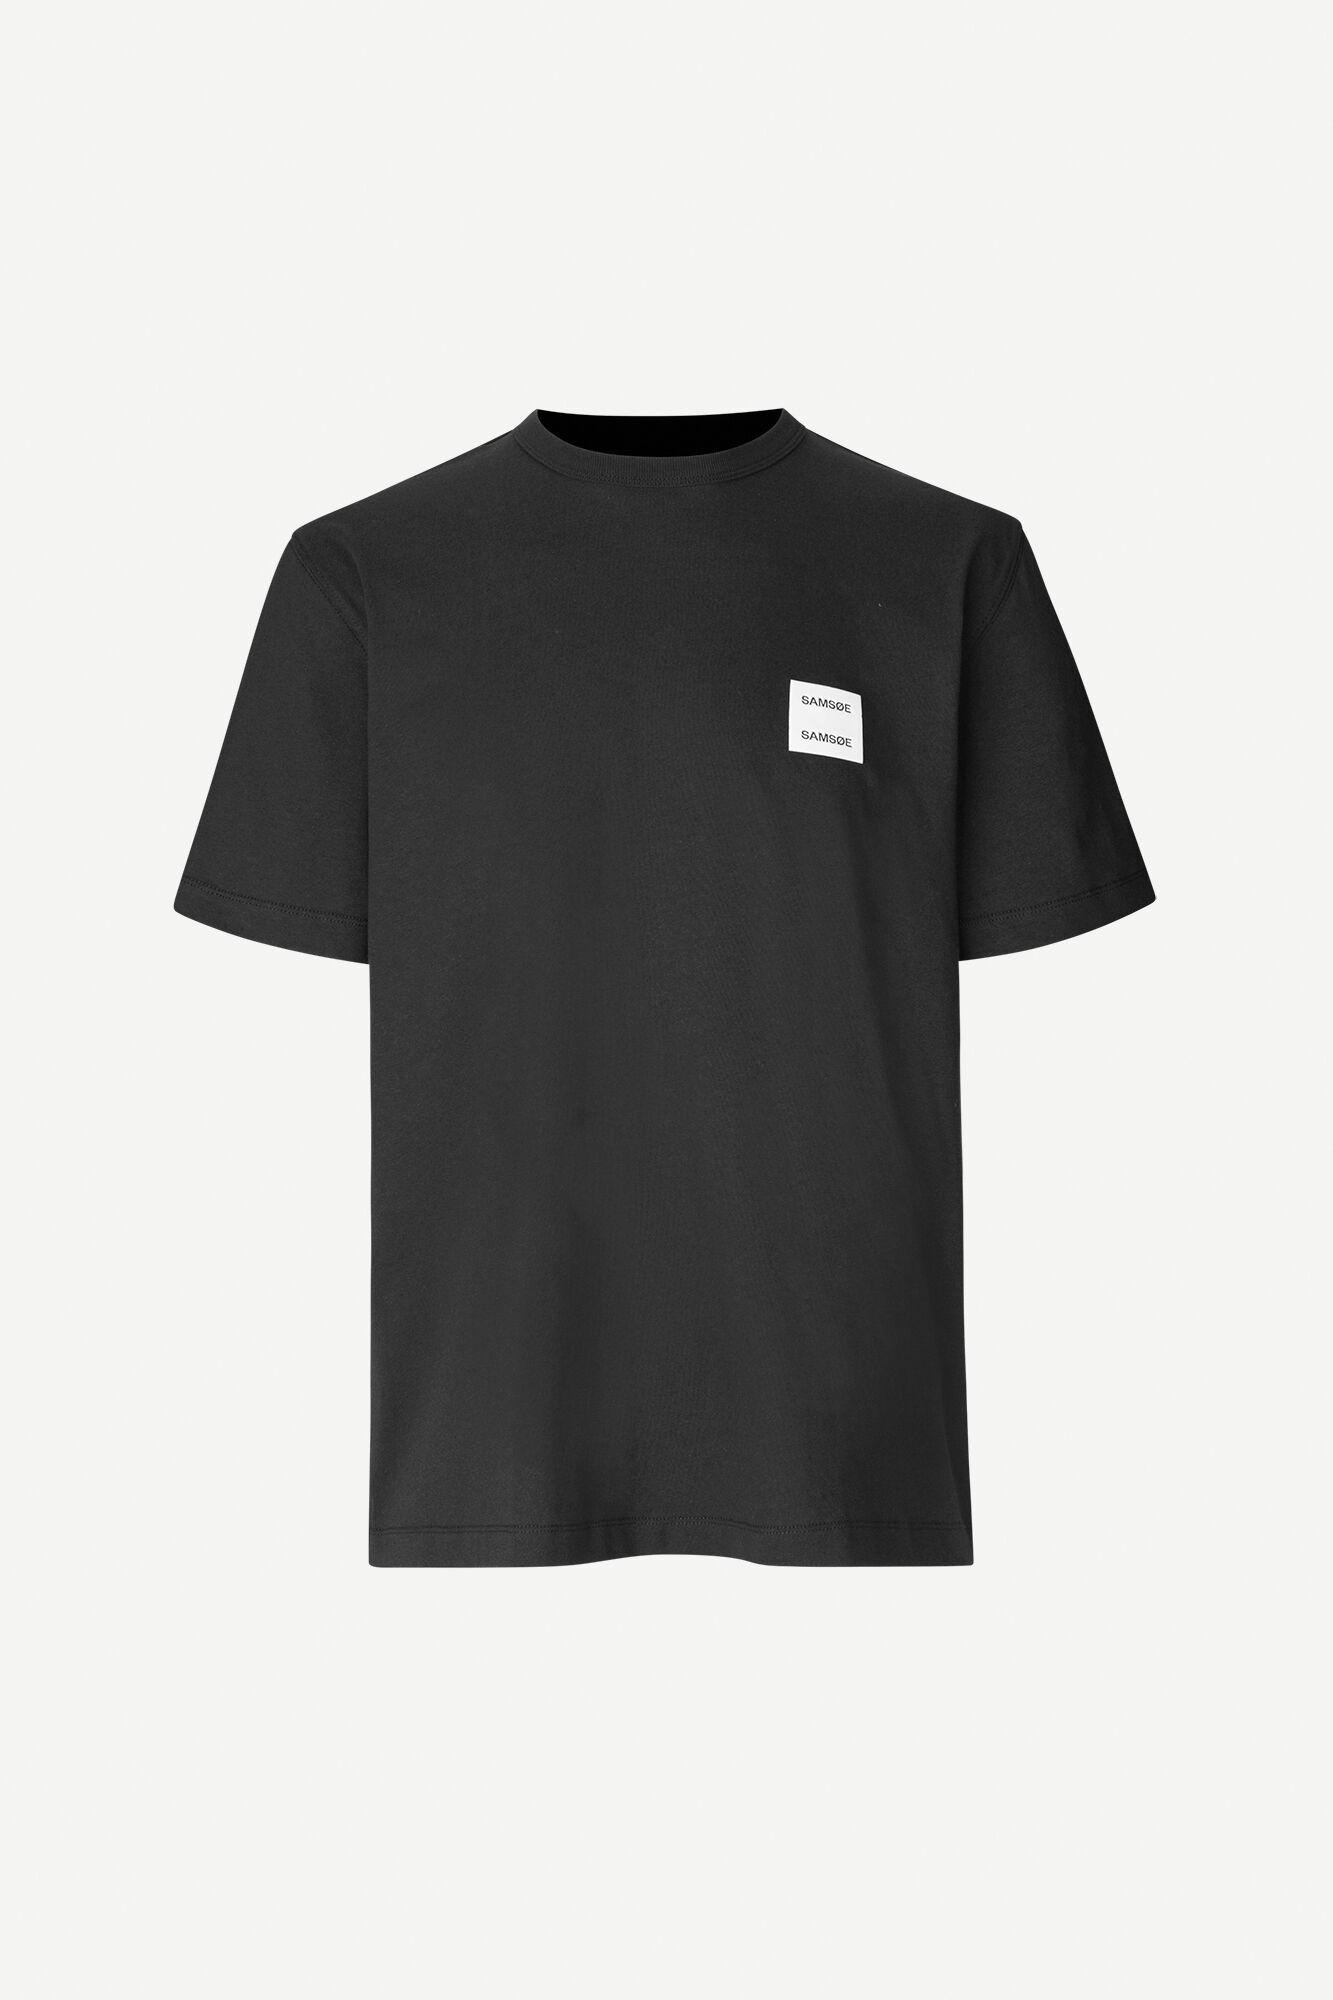 Tarko t-shirt 11415, BLACK